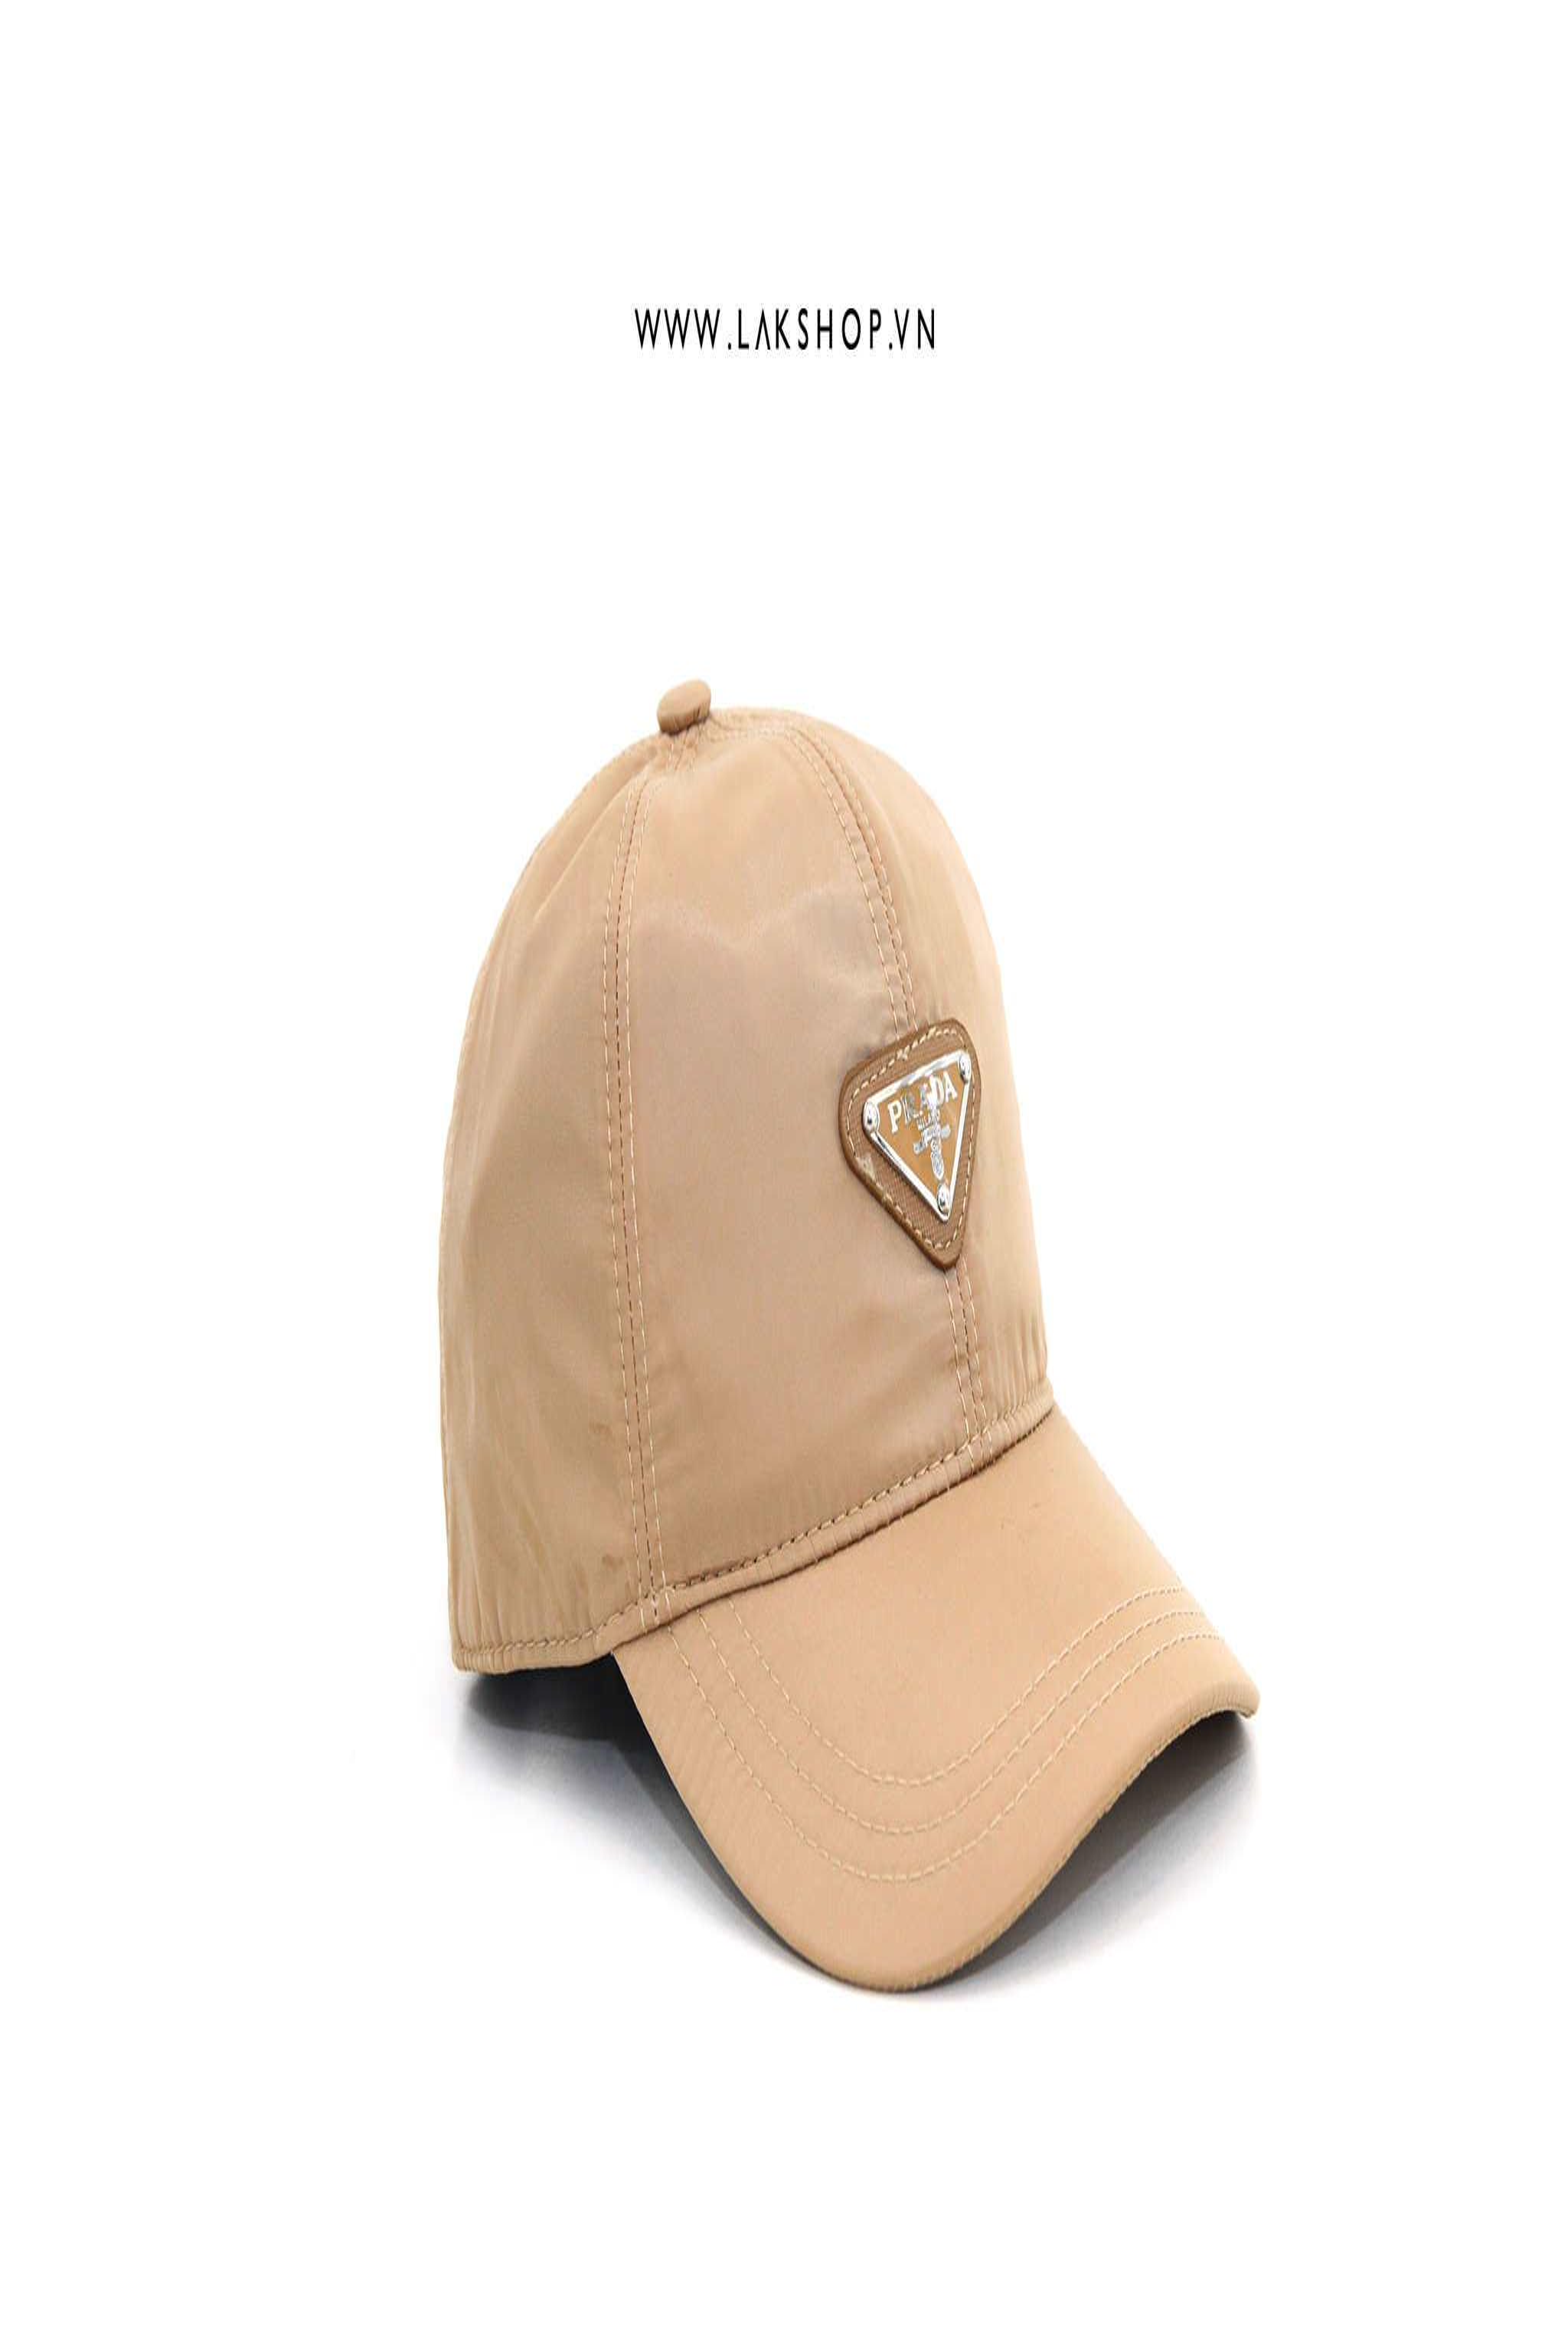 Burberry Vintage Check V-neck Cardigan